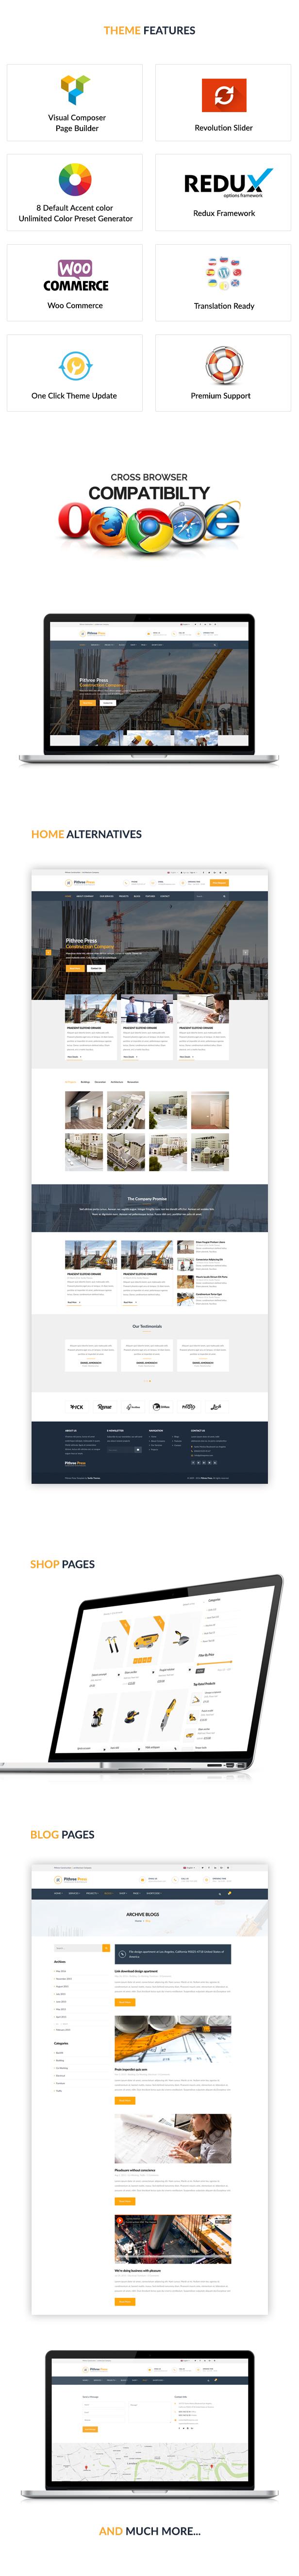 Pithree – Construction & Building WordPress Theme - 1